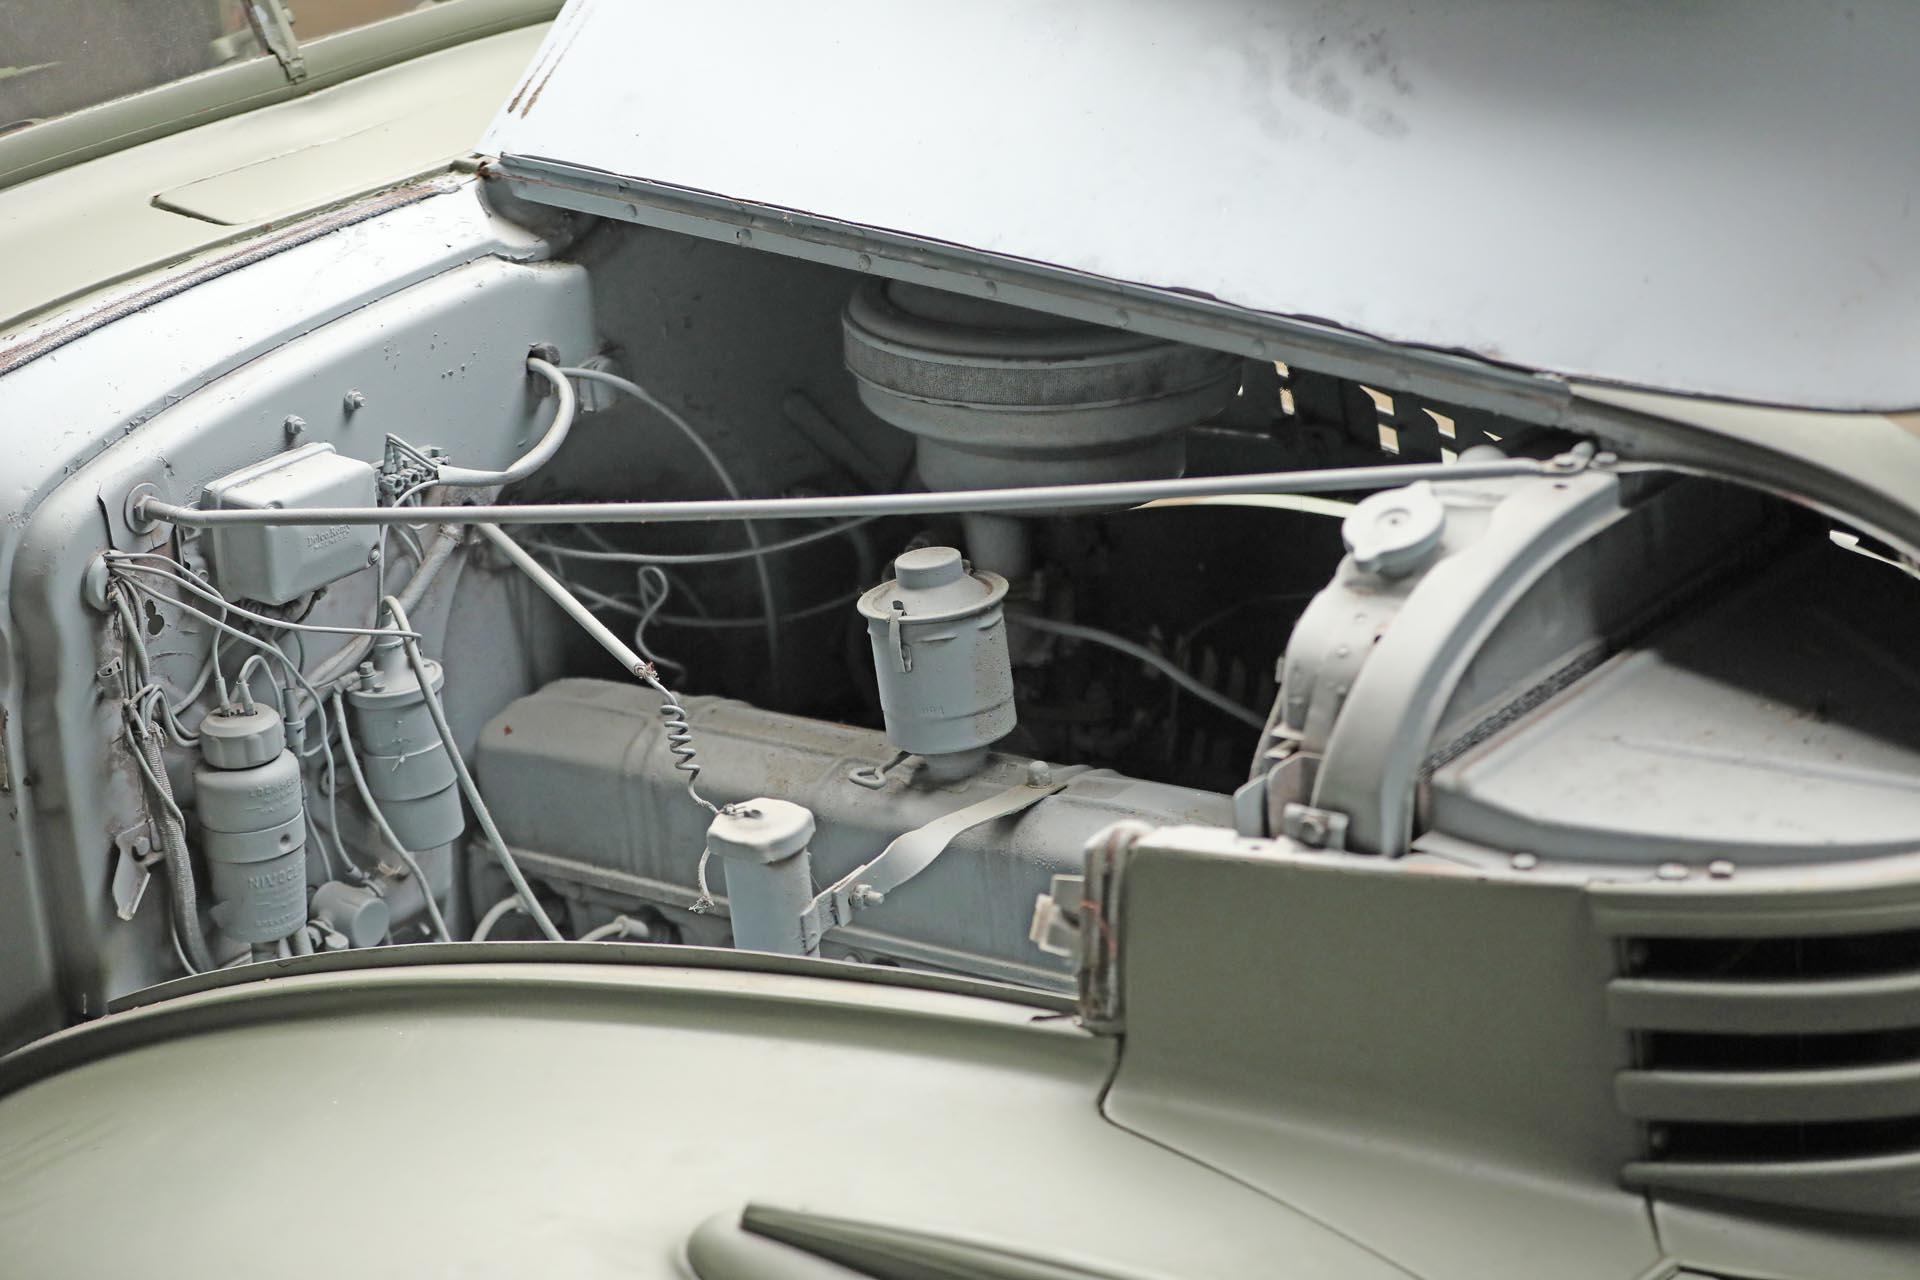 1941 Chevrolet 1543 GS Engine